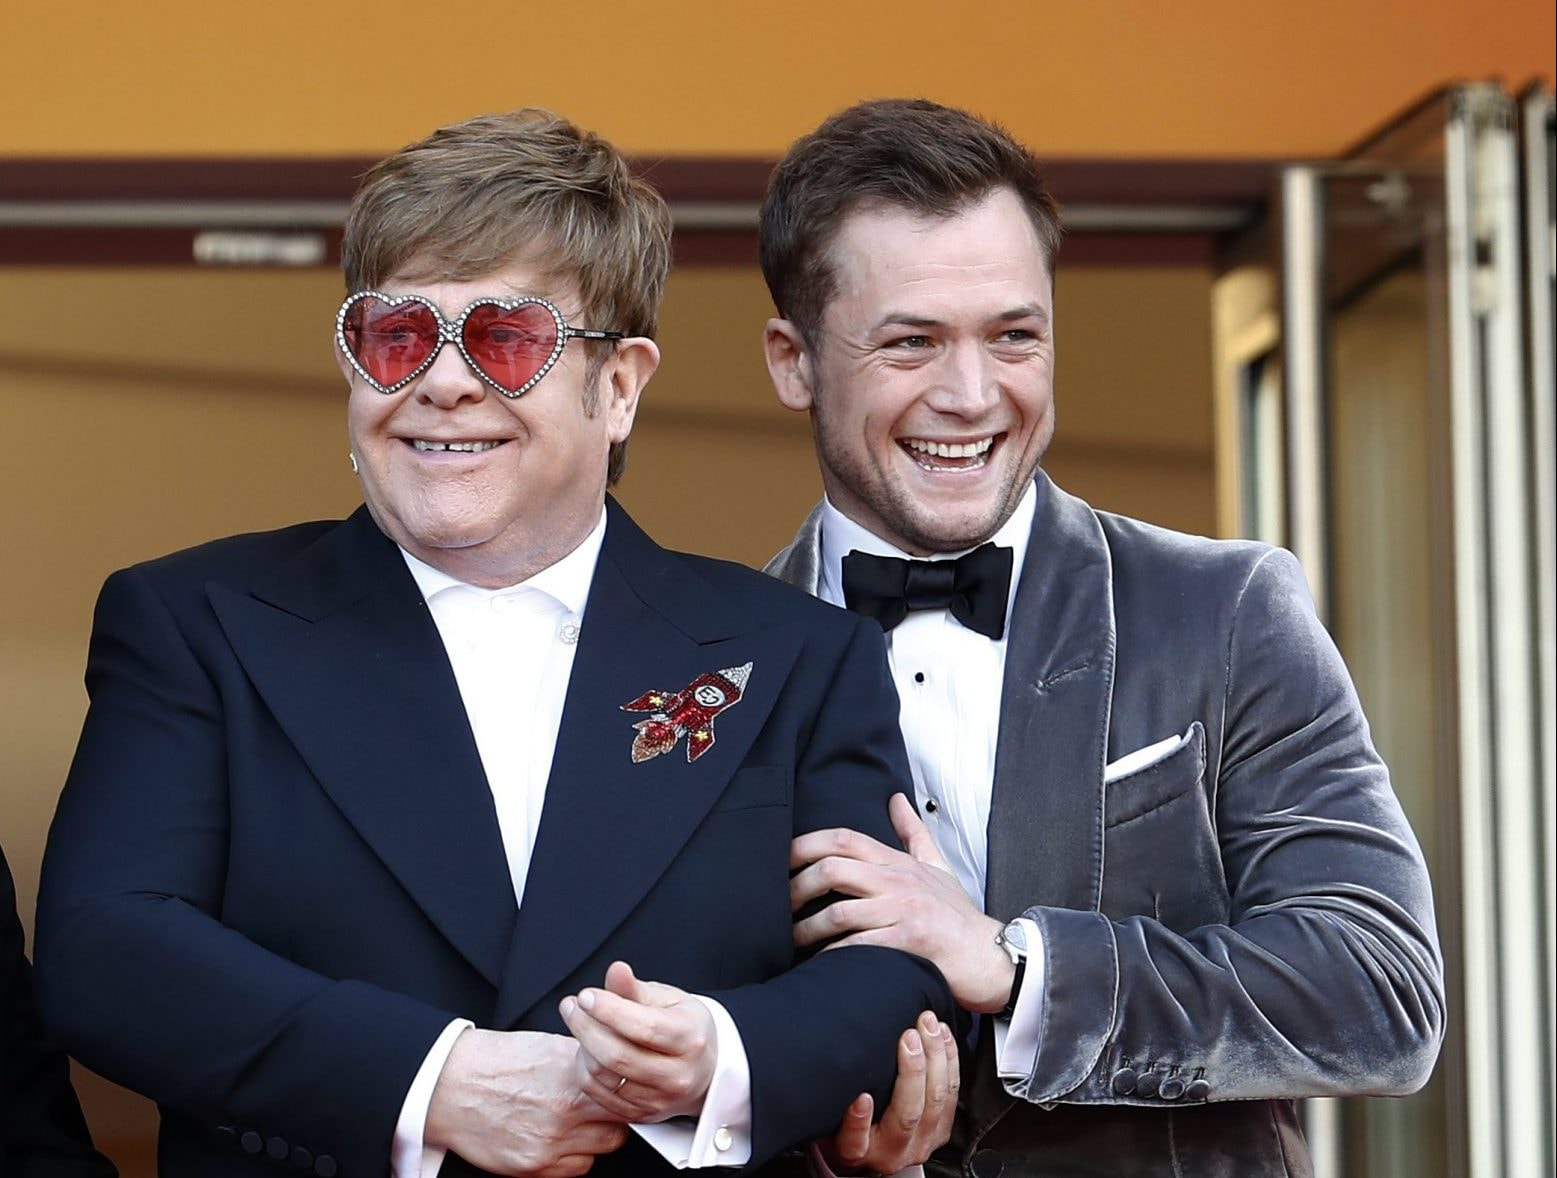 Elton John, Taron Egerton Performing at Special 'Rocketman